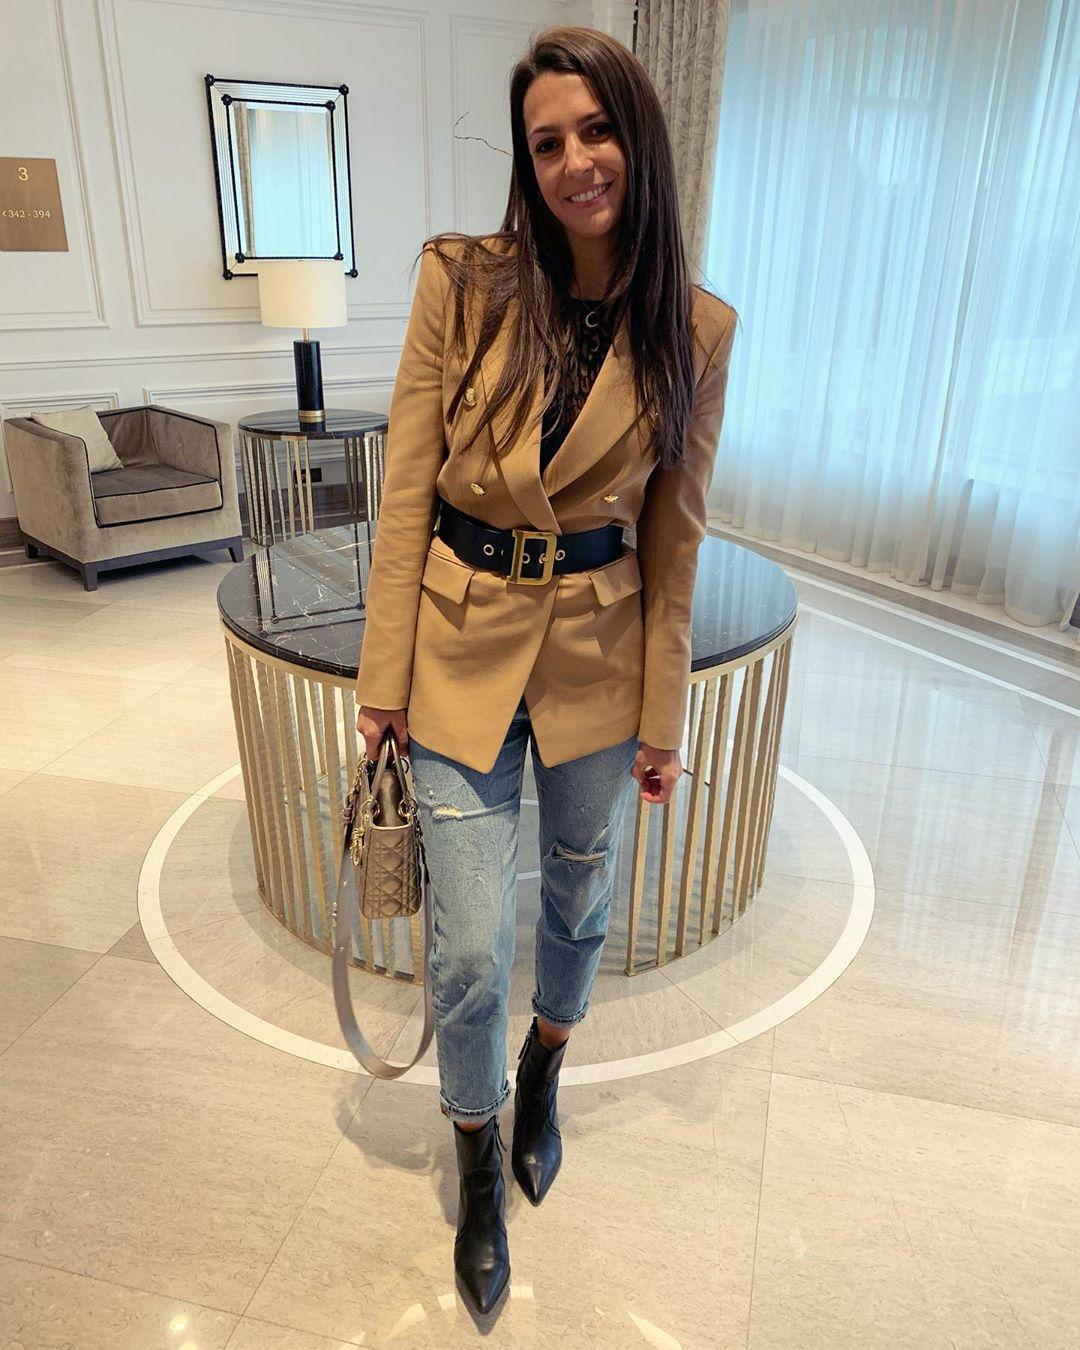 crossover breasted jacket de Zara sur stephanie.tuccitto